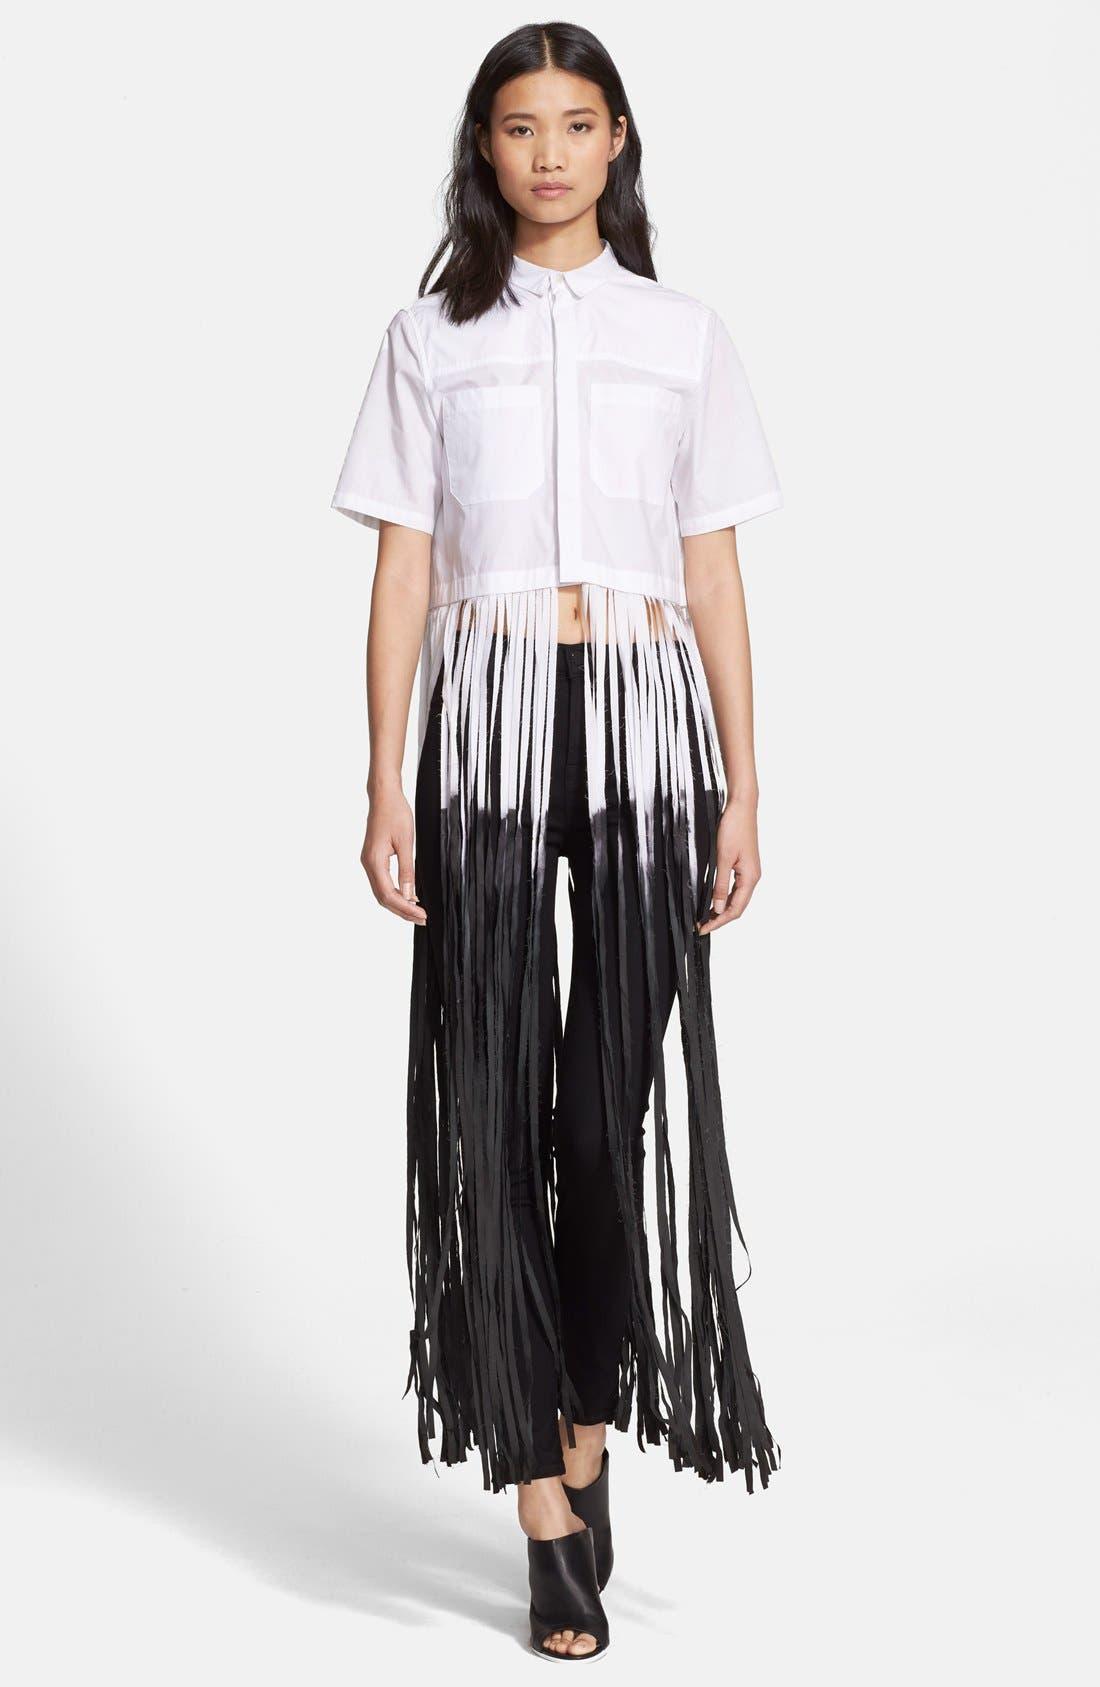 EACH X OTHER, Dip Dyed Long Fringe Cotton Poplin Shirt, Main thumbnail 1, color, 100